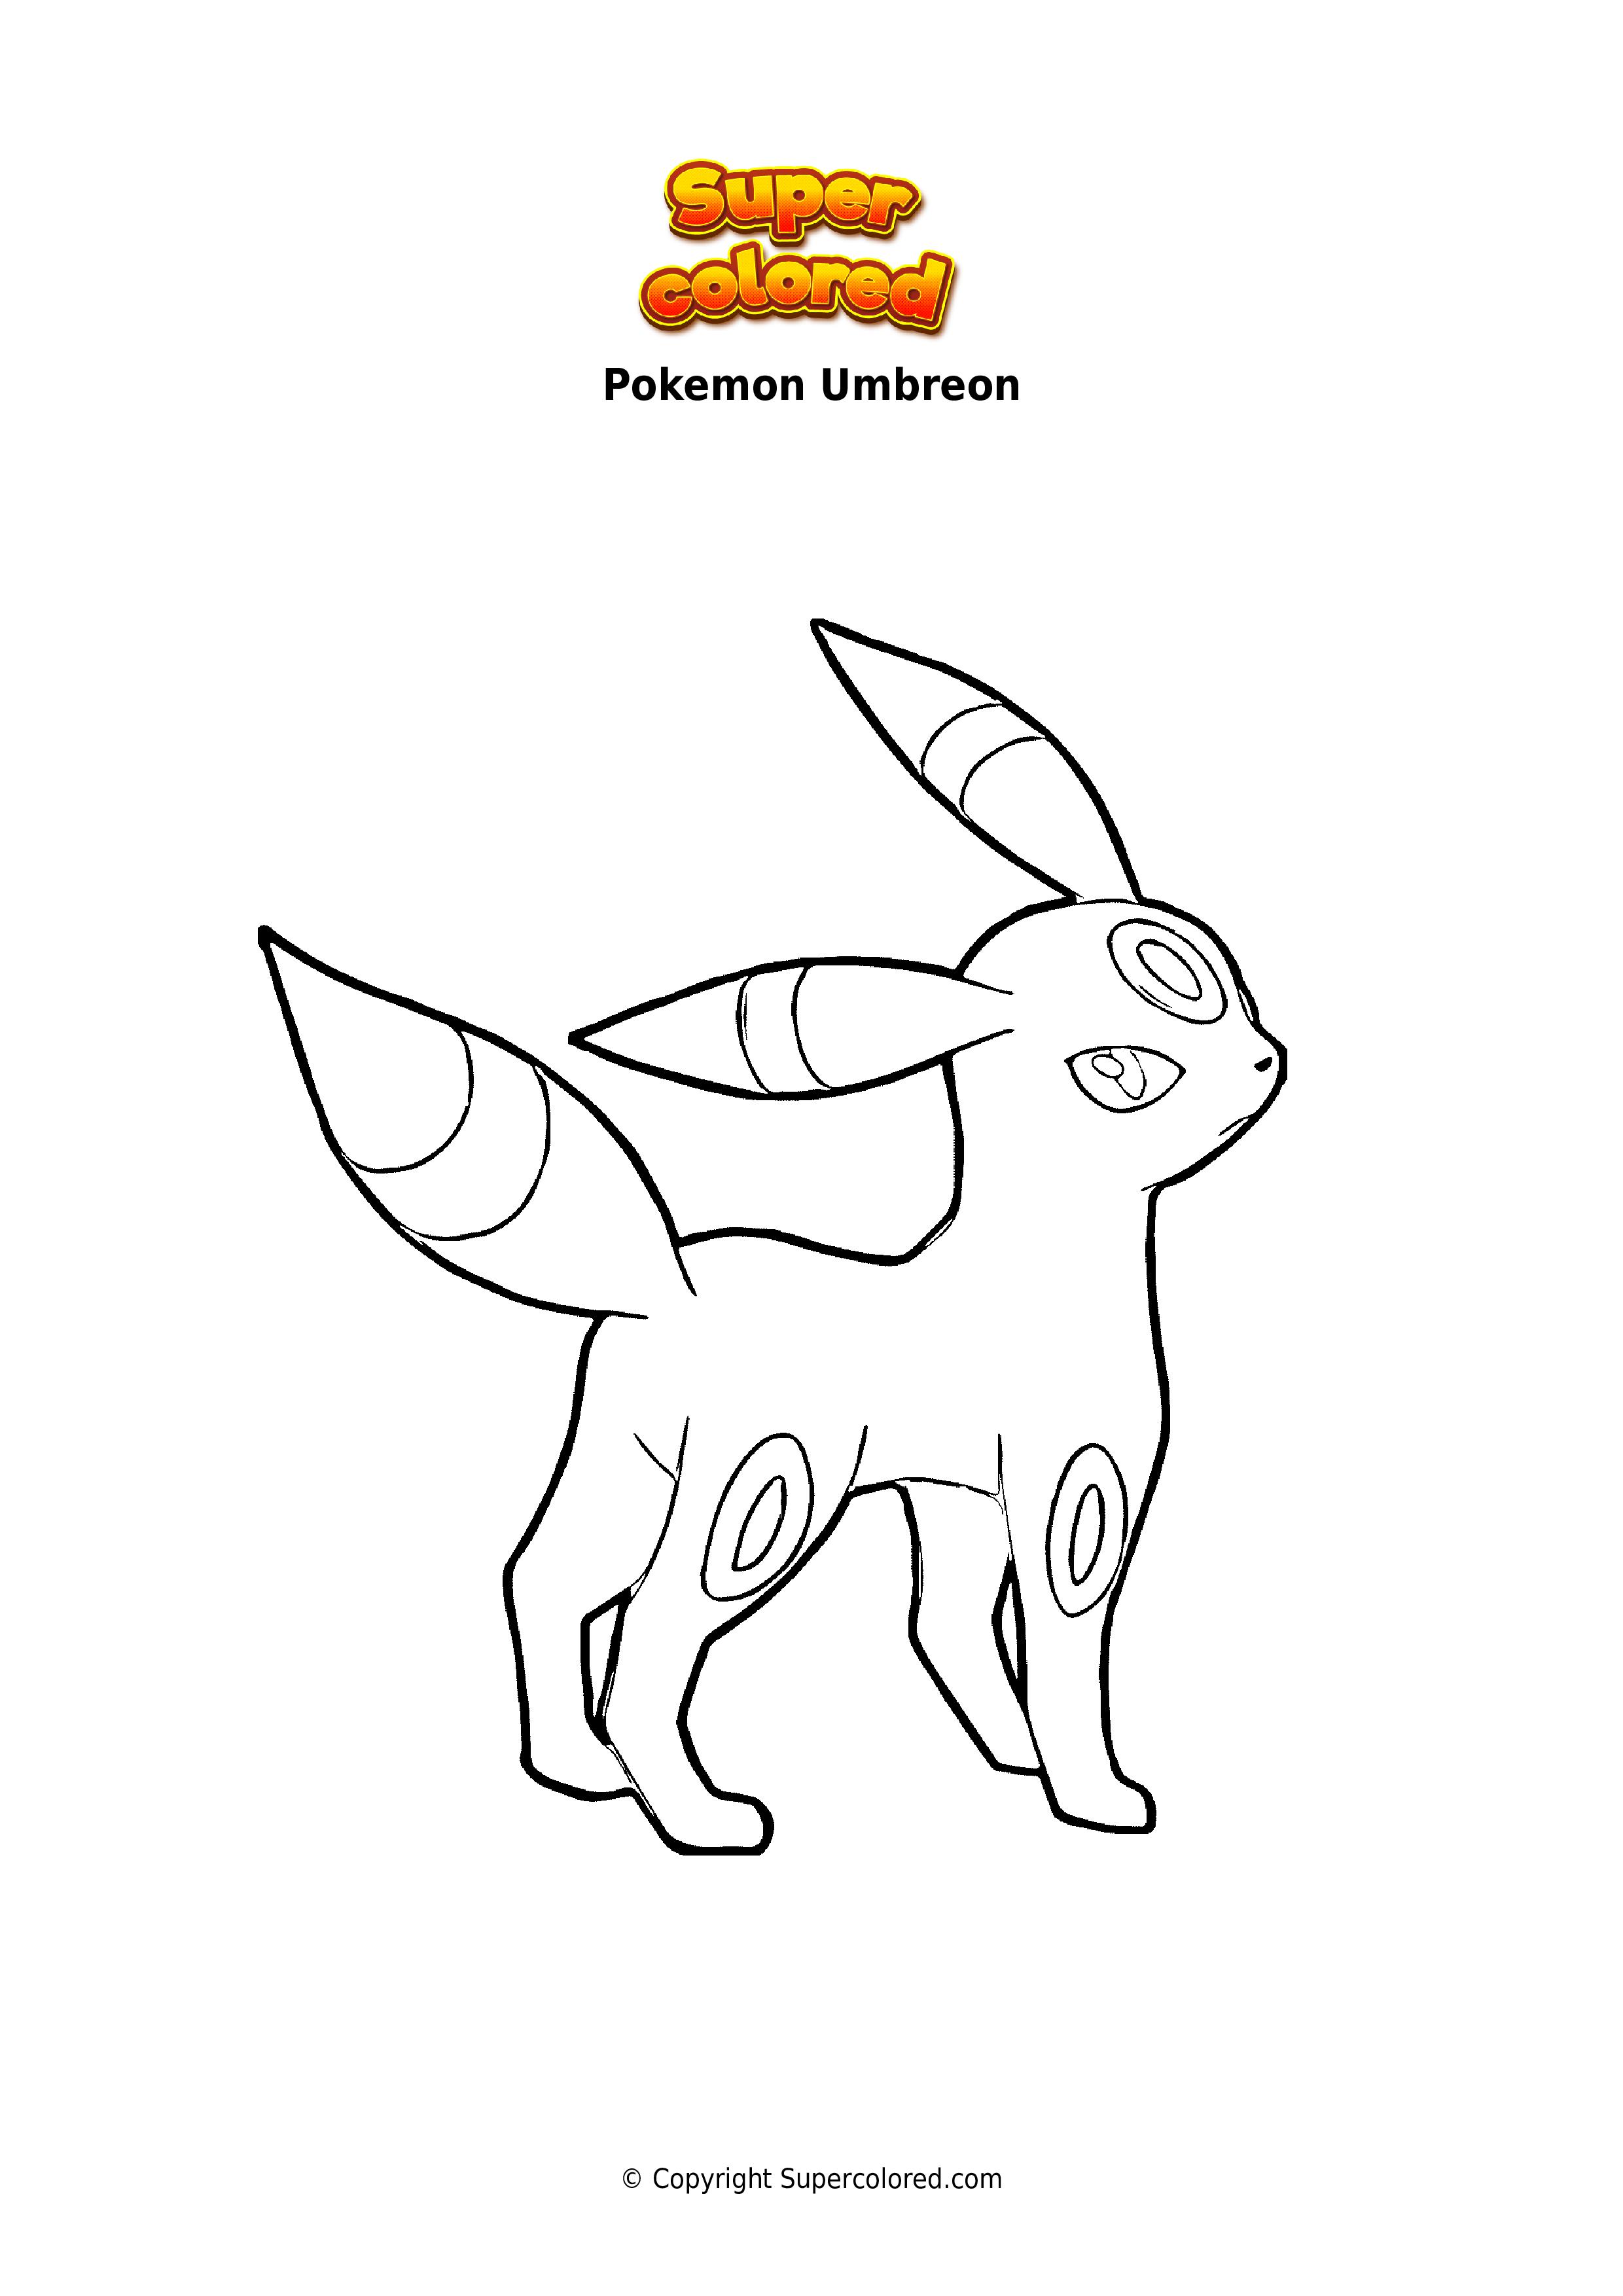 Coloring Page Pokemon Umbreon Supercolored Com